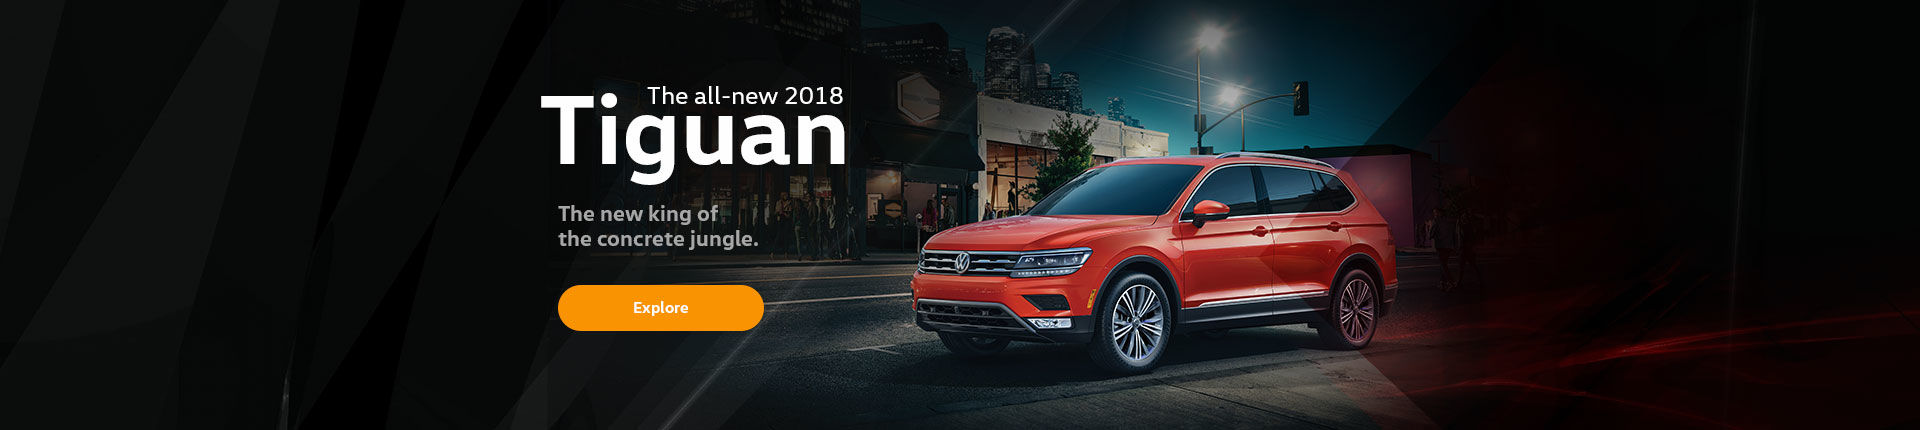 2018 Tiguan